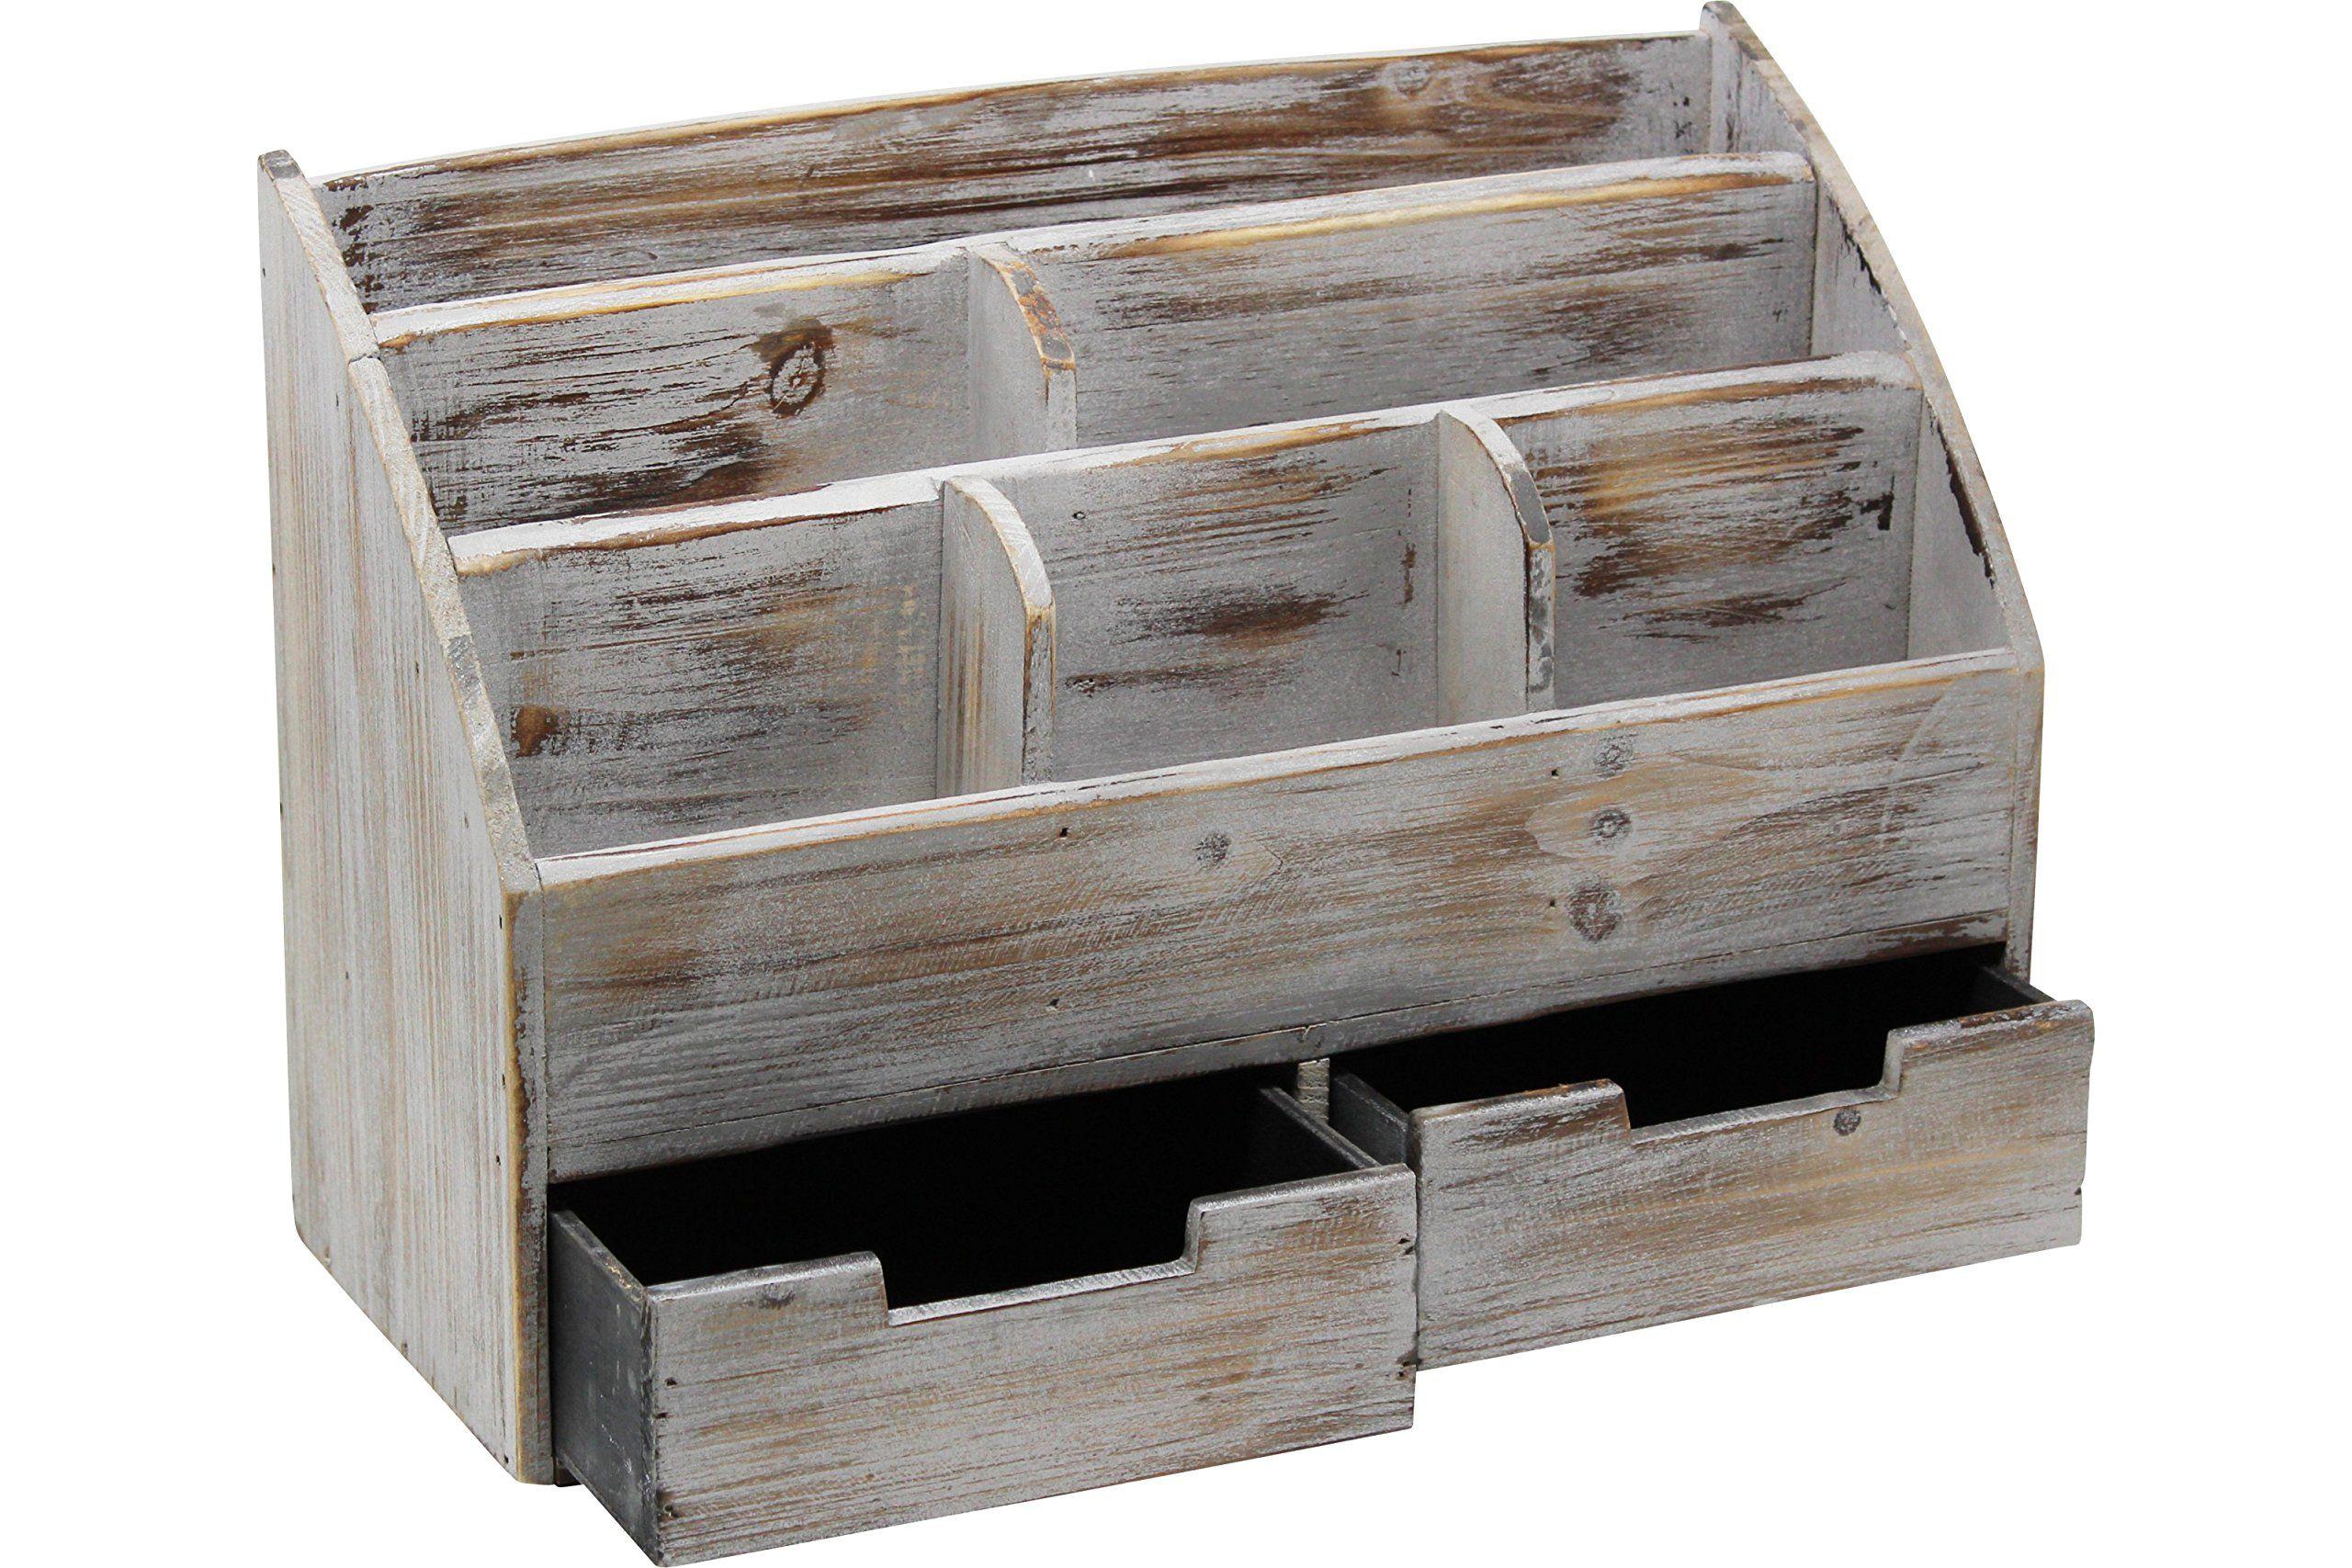 Vintage Rustic Wooden Office Desk Organizer And Mail Rack For Desktop Ta Office Supplies Desk Accessories Desk Organization Office Wooden Office Desk